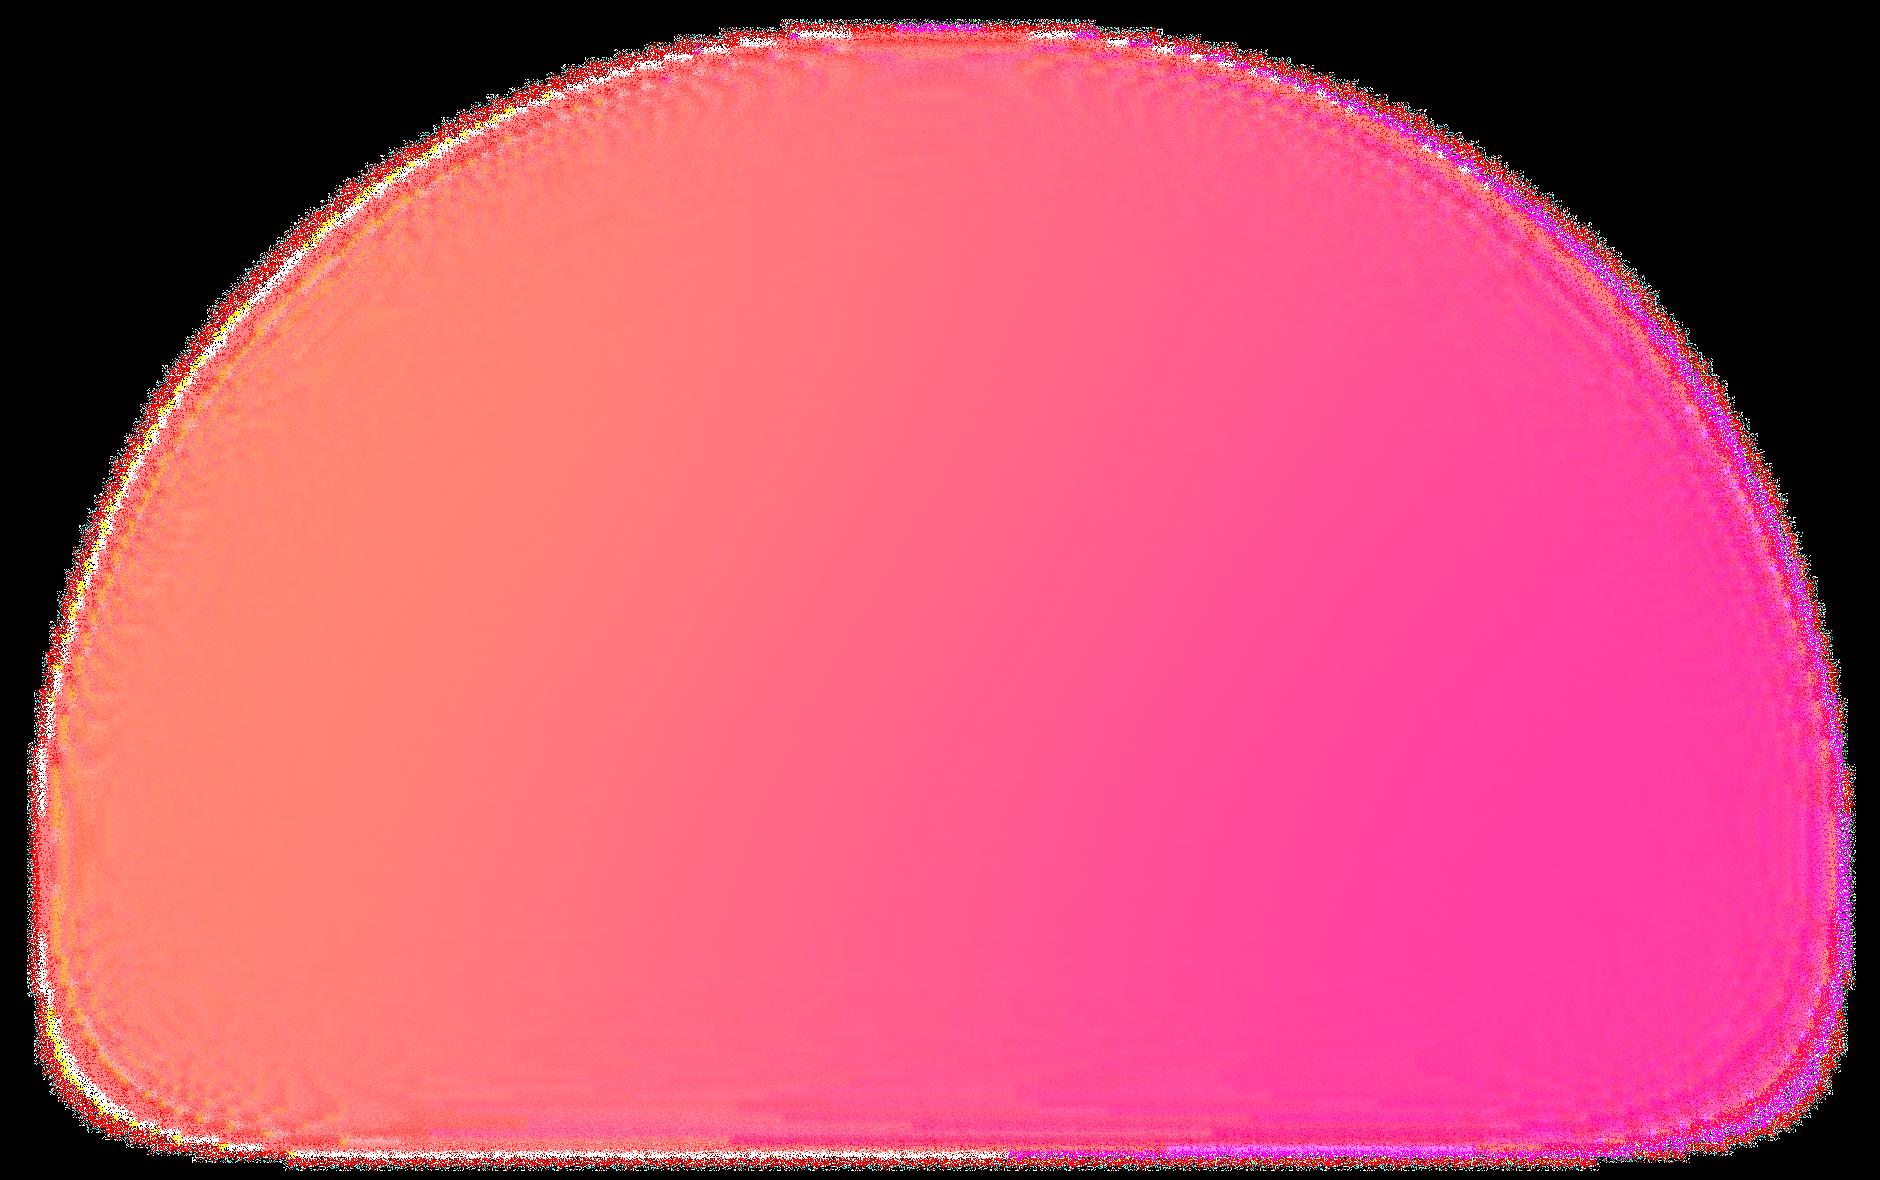 gradient color background